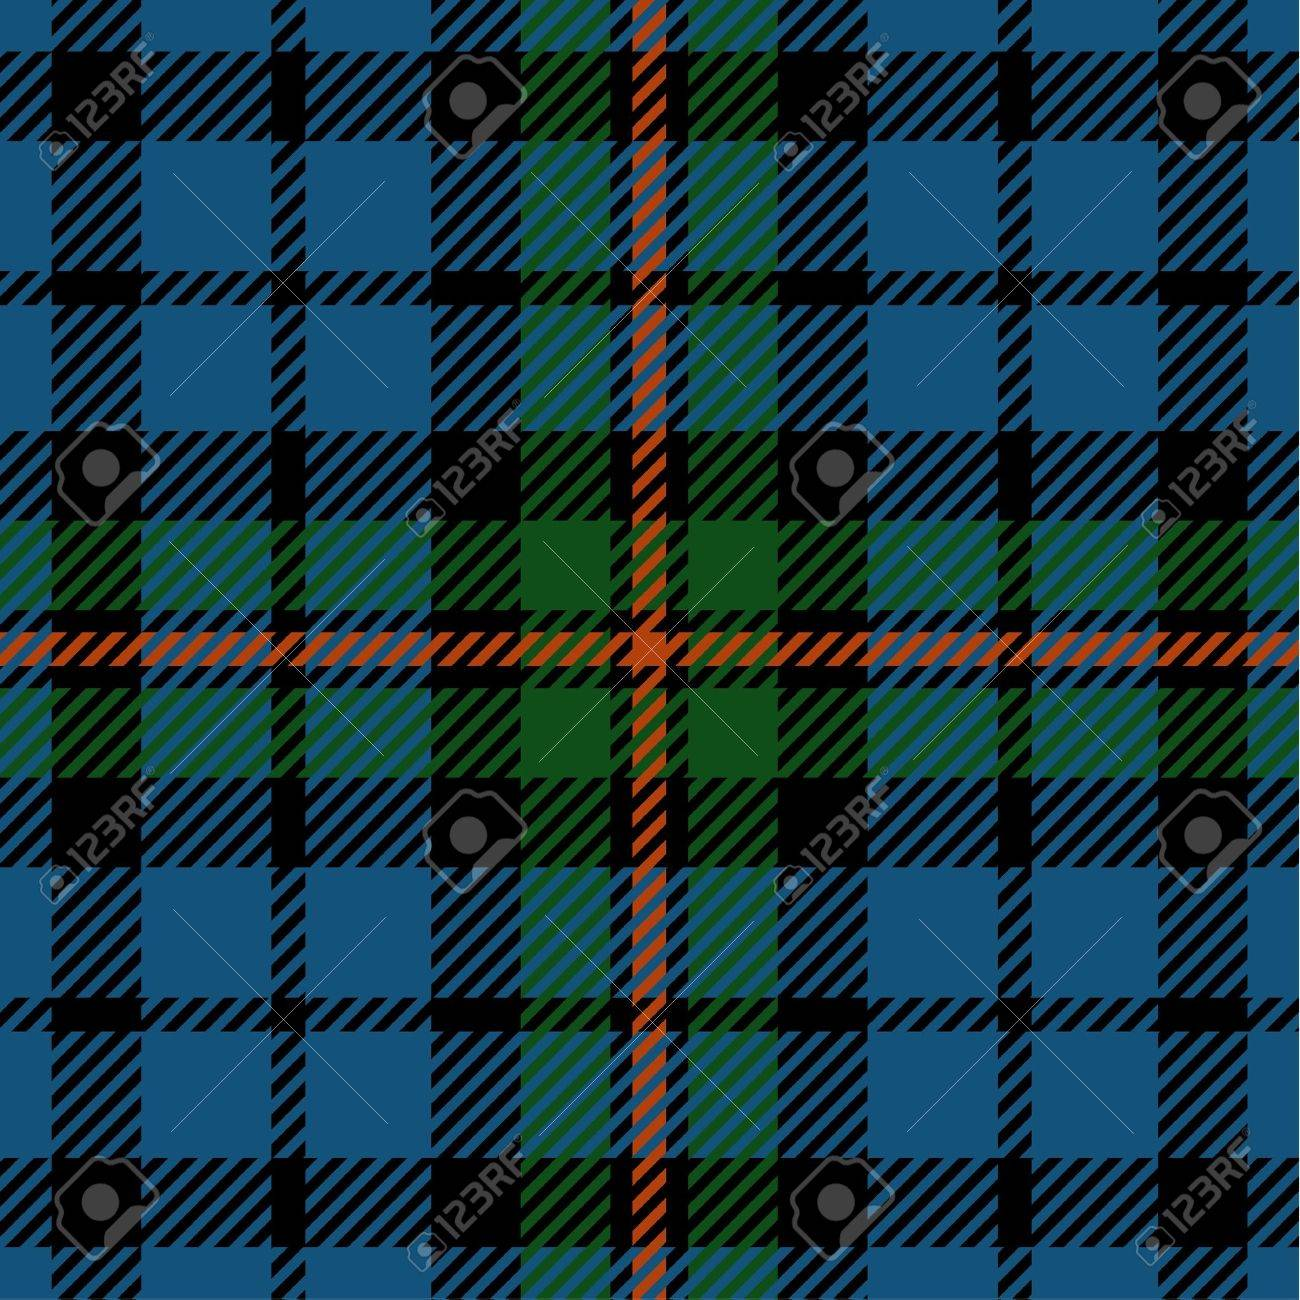 Tartan pattern - 15374816